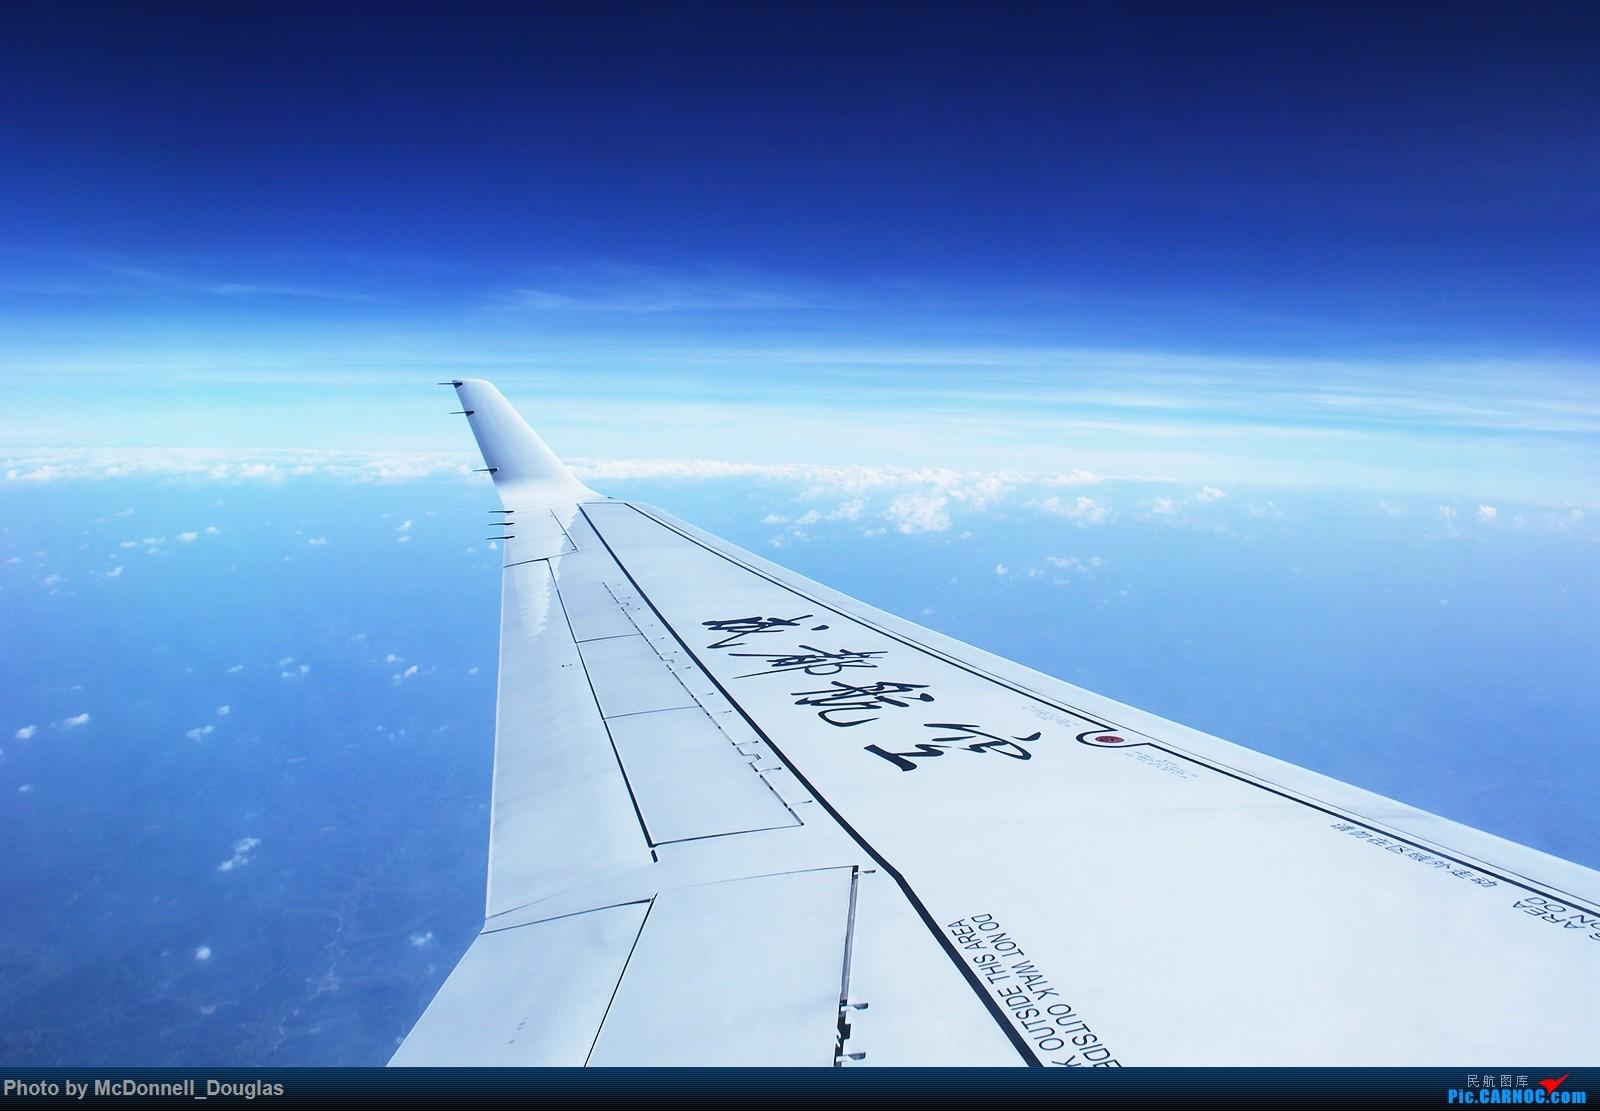 Re:[原创]【上海飞友会】【zc带你走天下(3)】再访祖辈年轻时工作的土地,父母年少时生活戈壁,跨越大半个中国去看新疆,回程小游蓉城(下)【已更至ARJ21详尽评测 COMAC ARJ21-700 B-3321